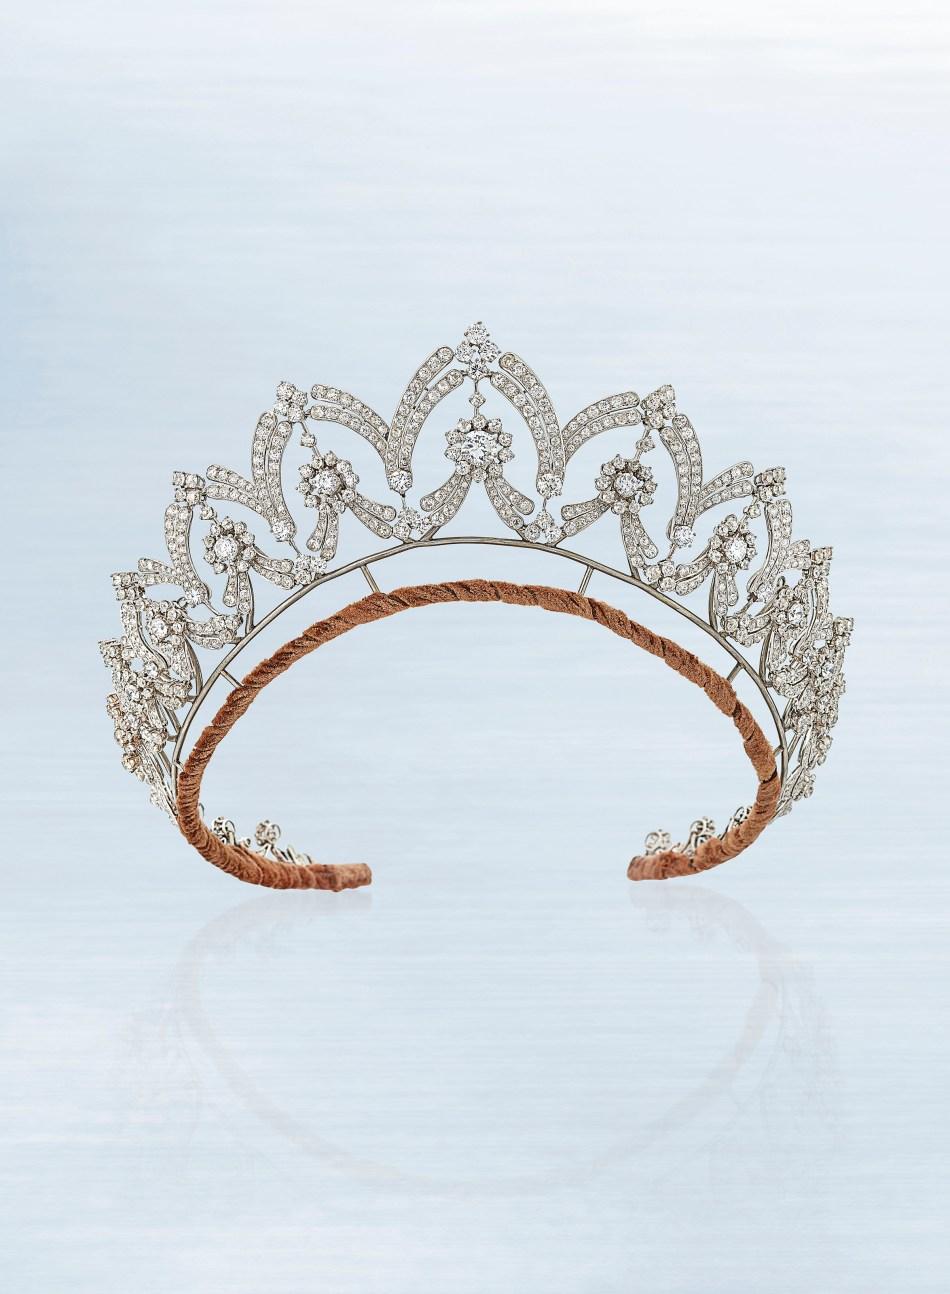 Lot 188 (art_deco_diamond_tiara_necklace_boucheron)